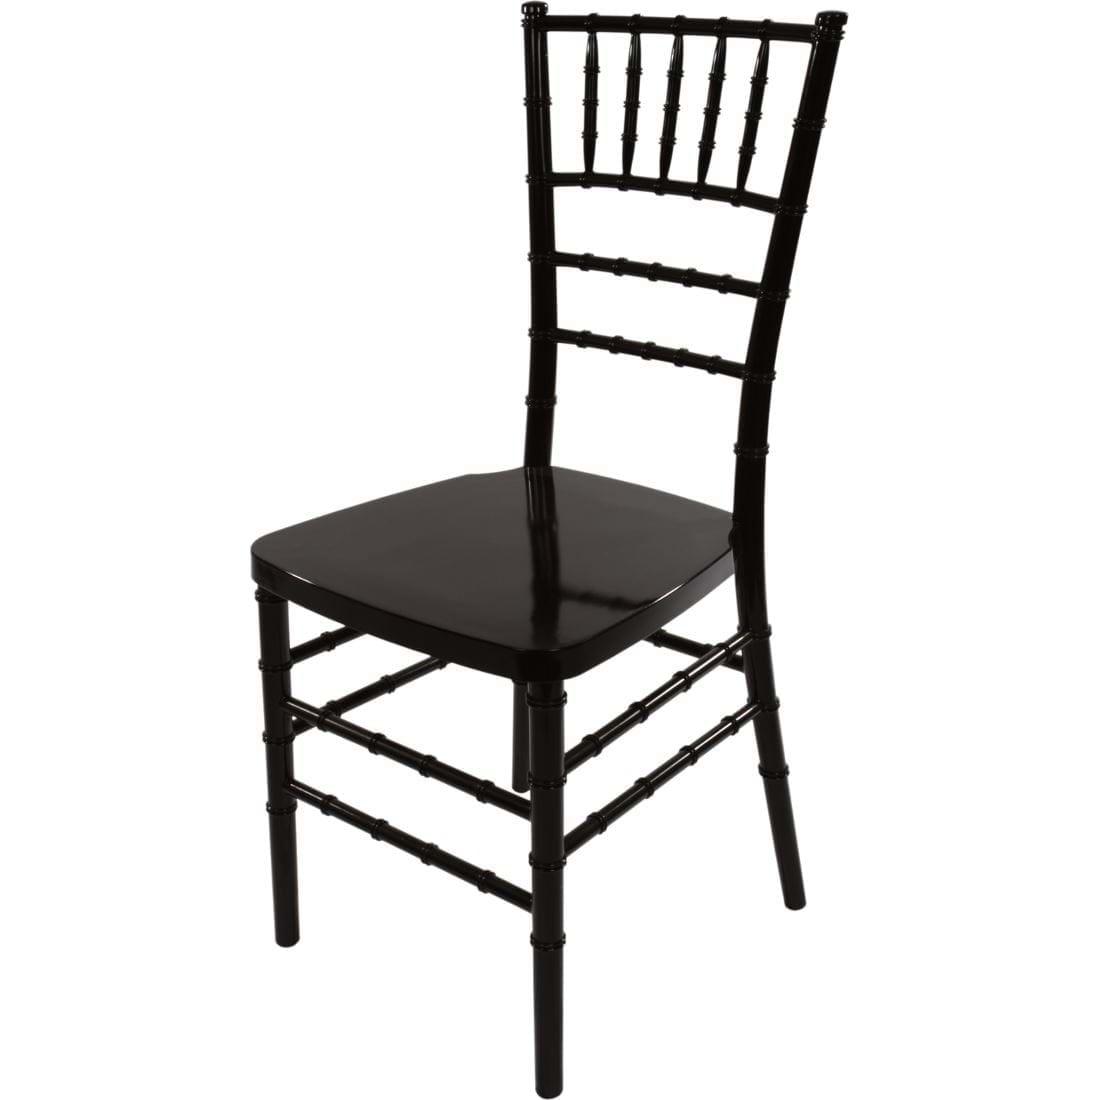 Black Resin Chiavari Chairs Black Chiavari Chair